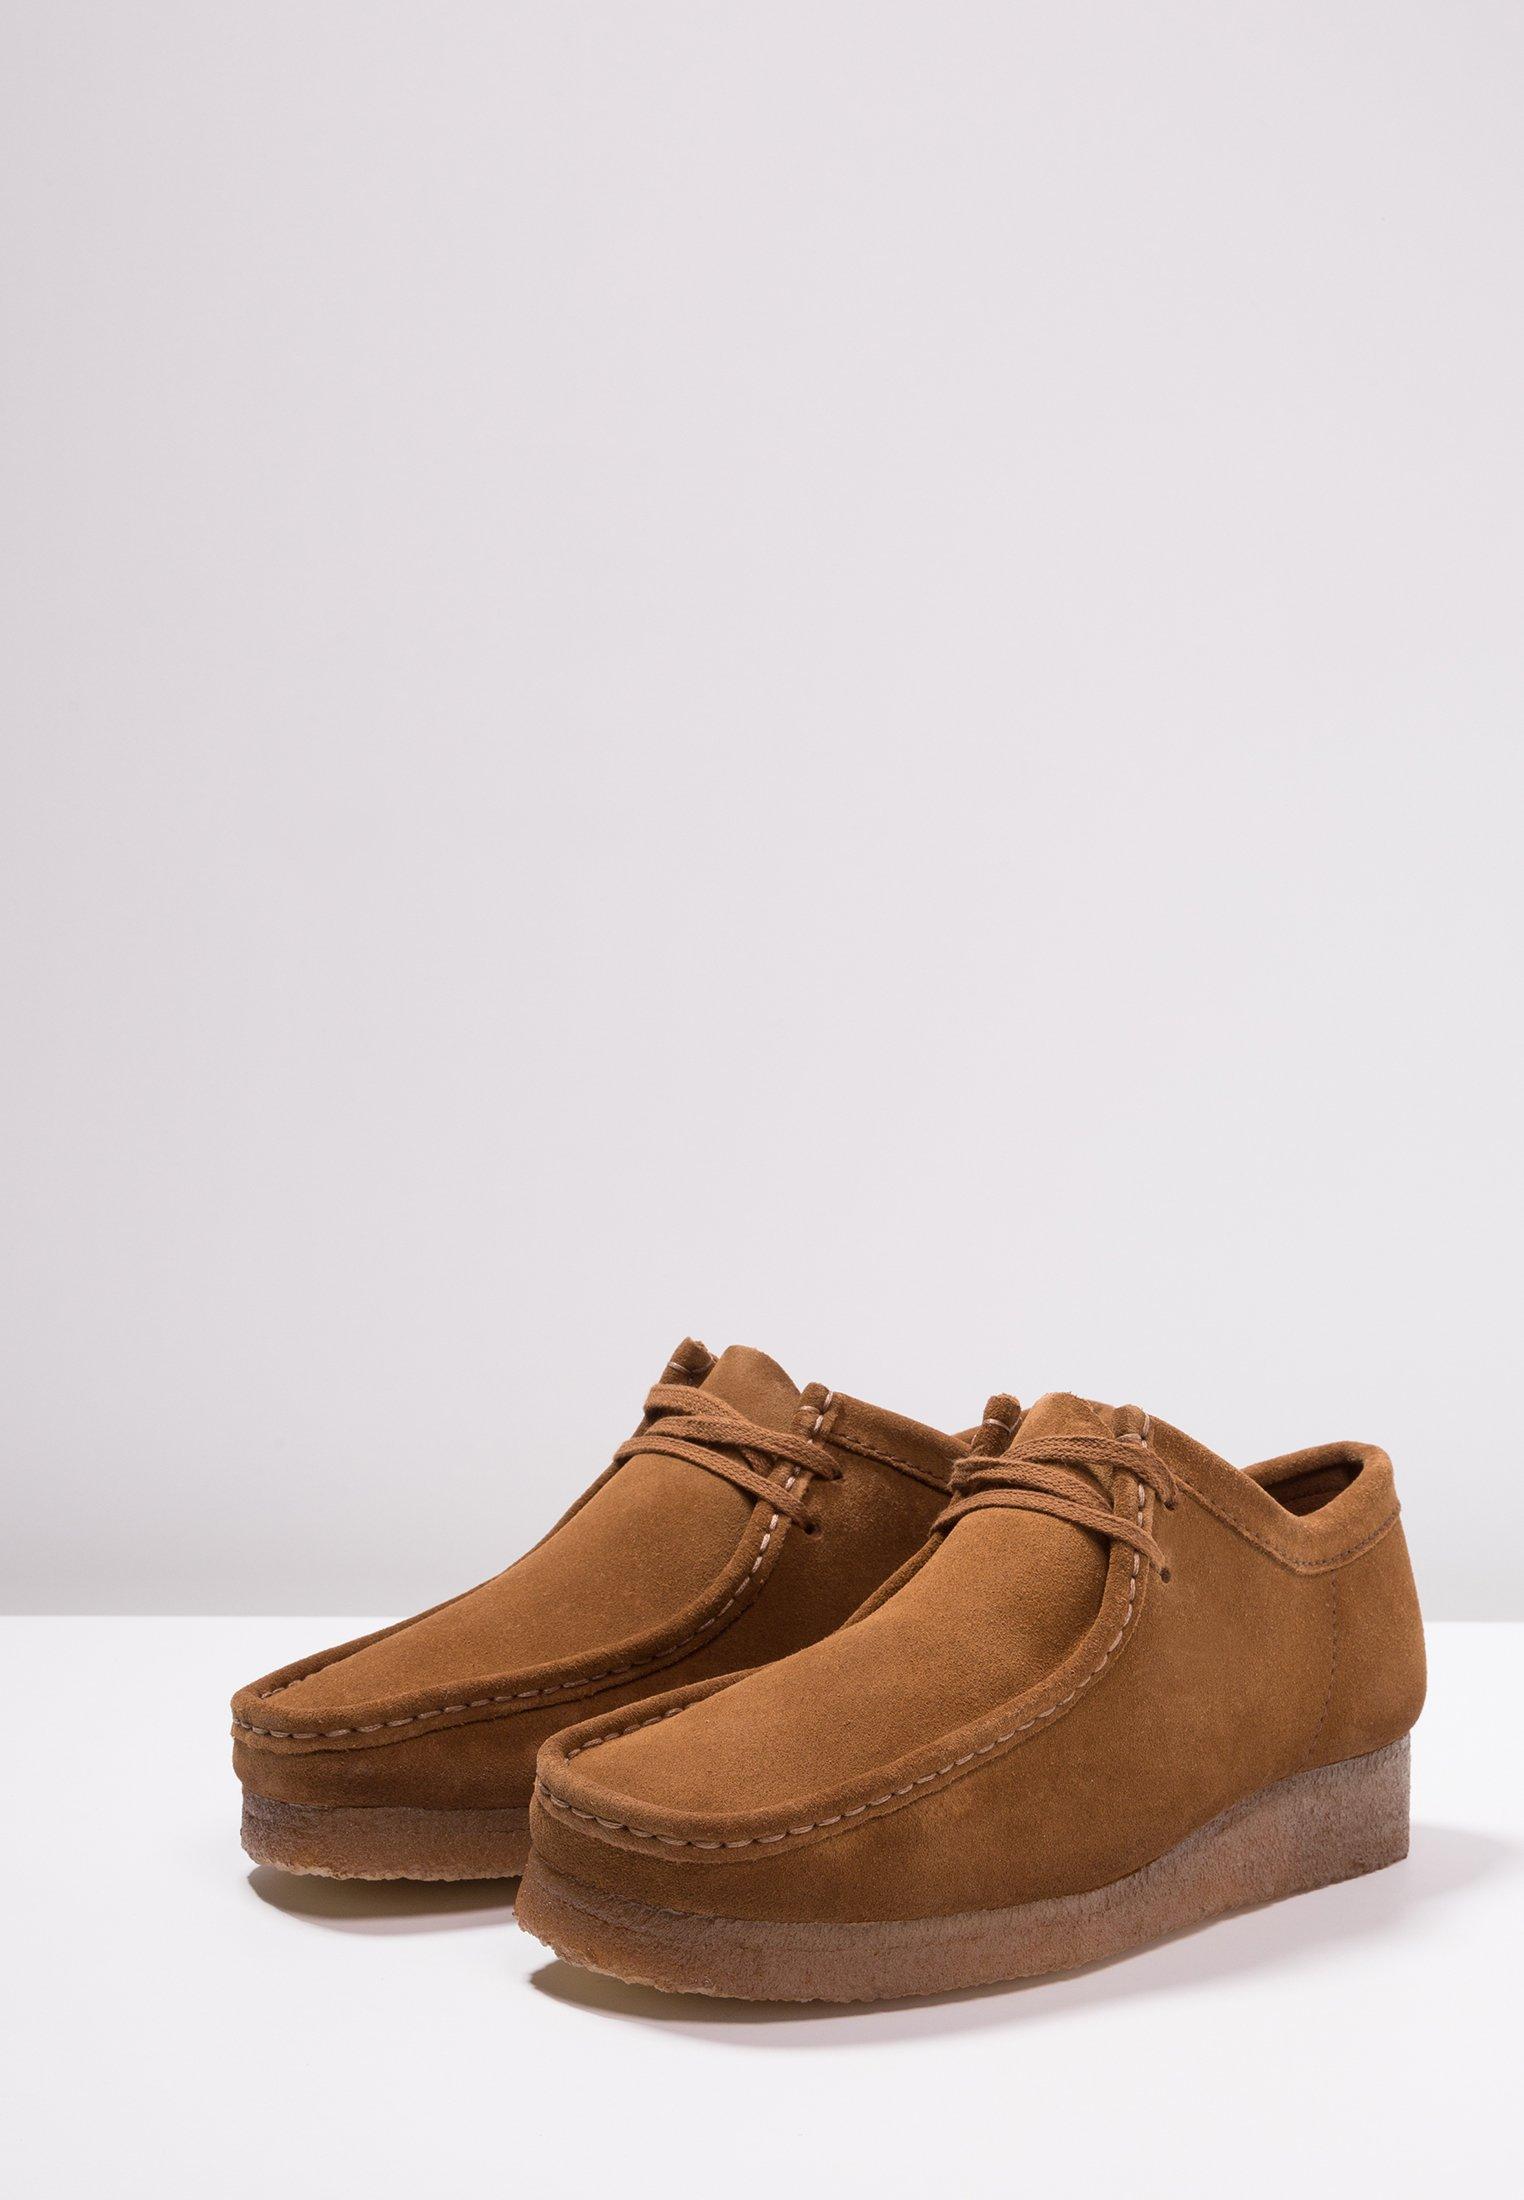 WALLABEE SCHNÜRSENKEL WEISS Chaussures à lacets cola